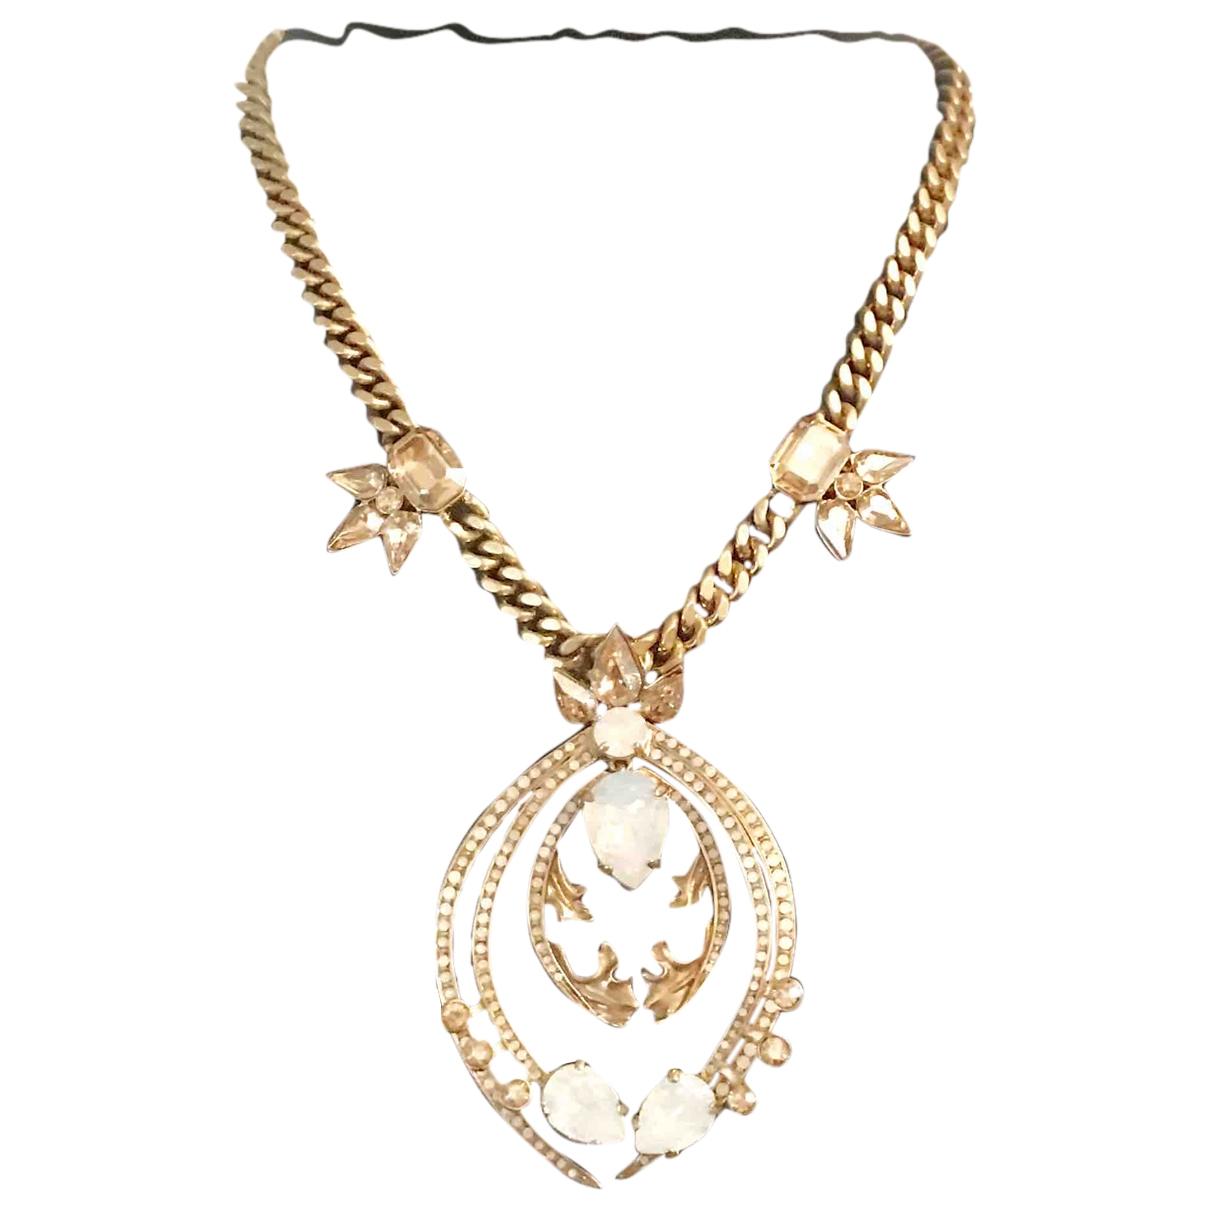 Roberto Cavalli \N Kette in  Gold Metall